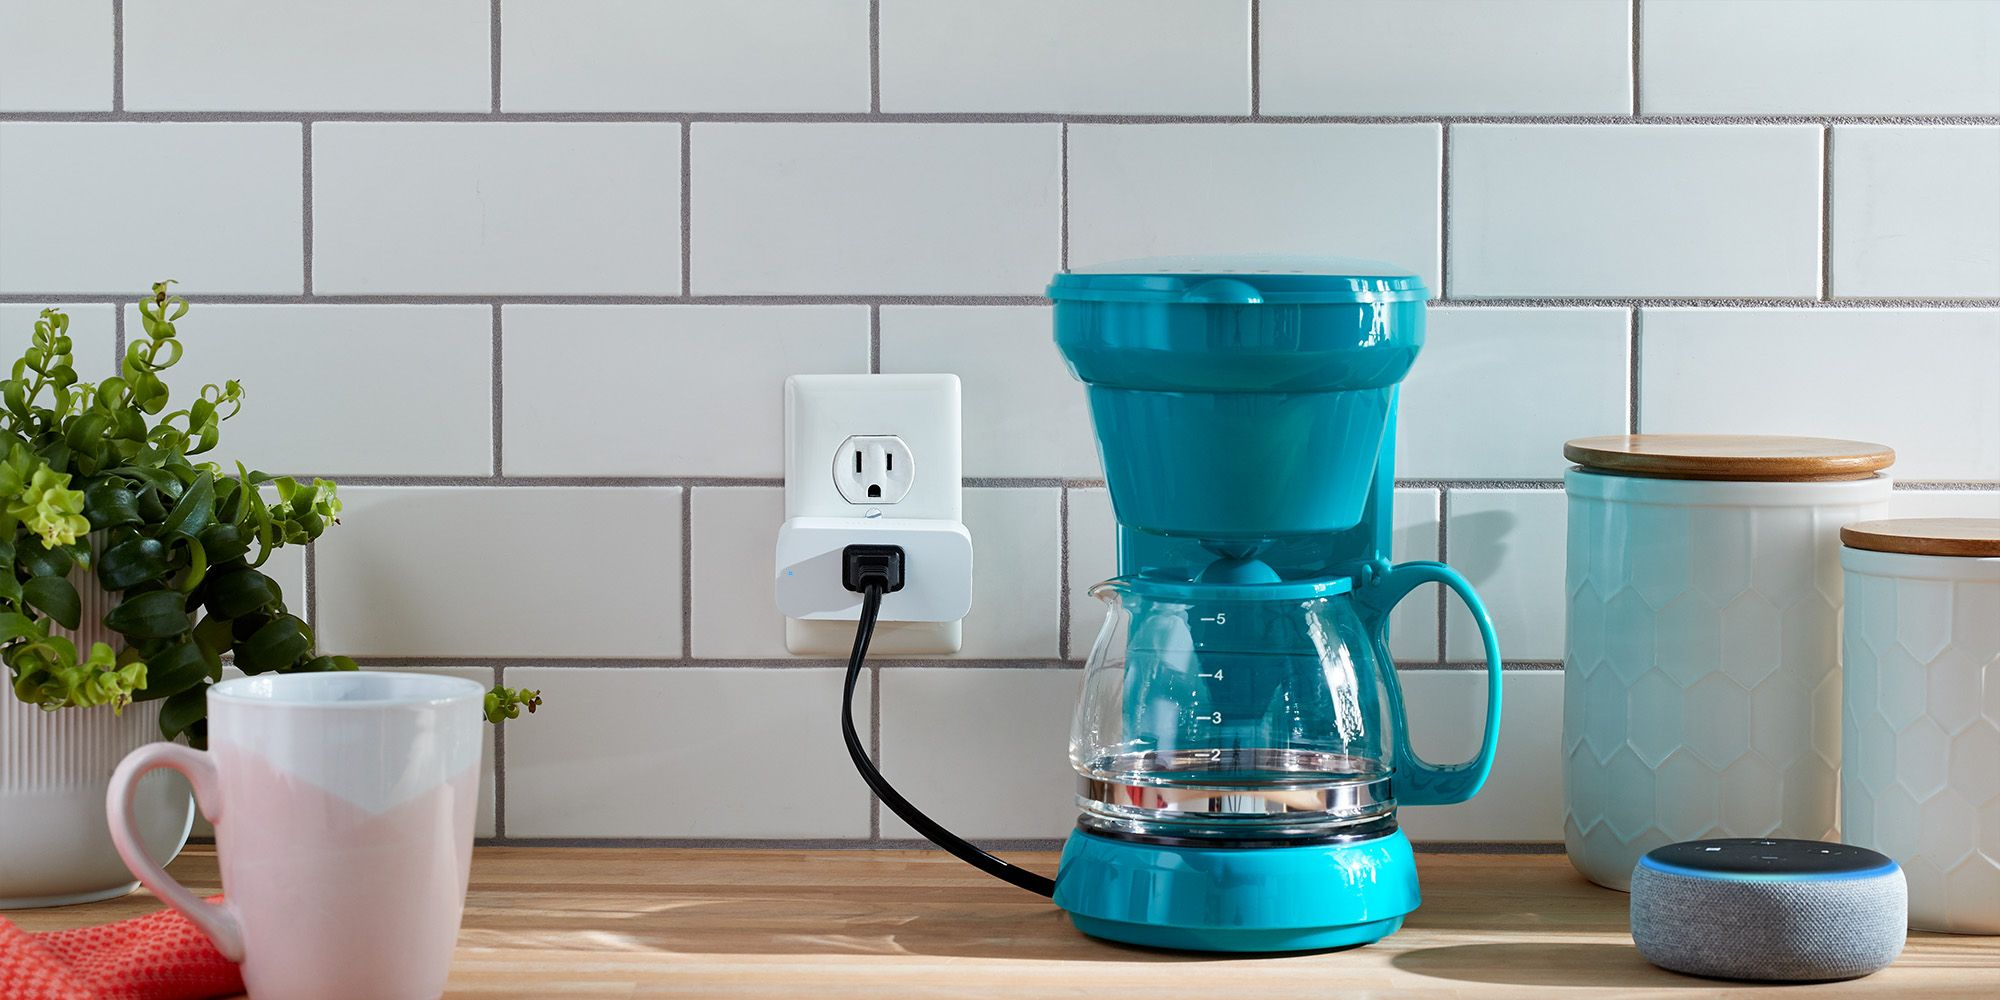 Amazon Smart Plug in a kitchen